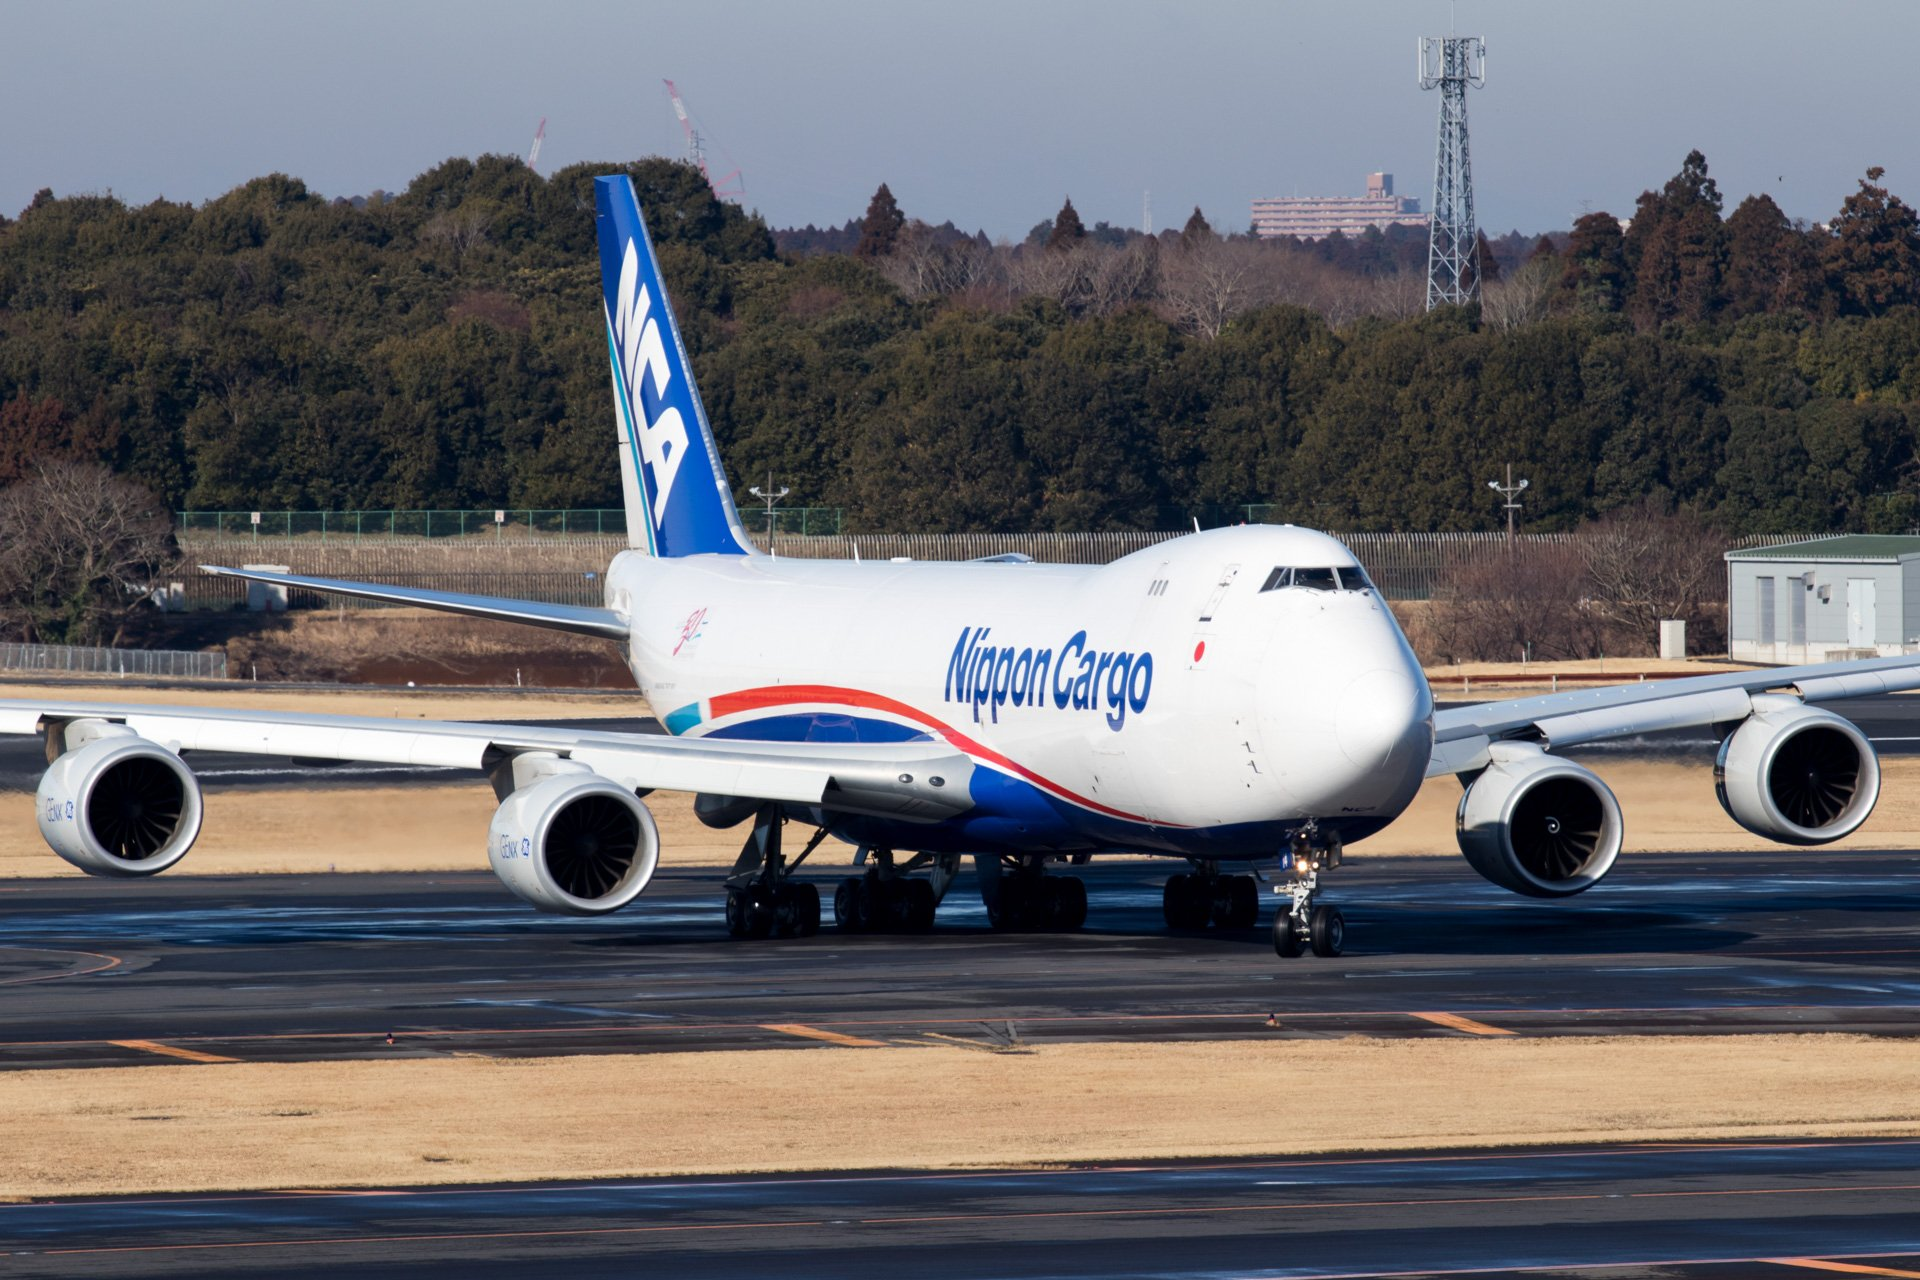 NCA 747